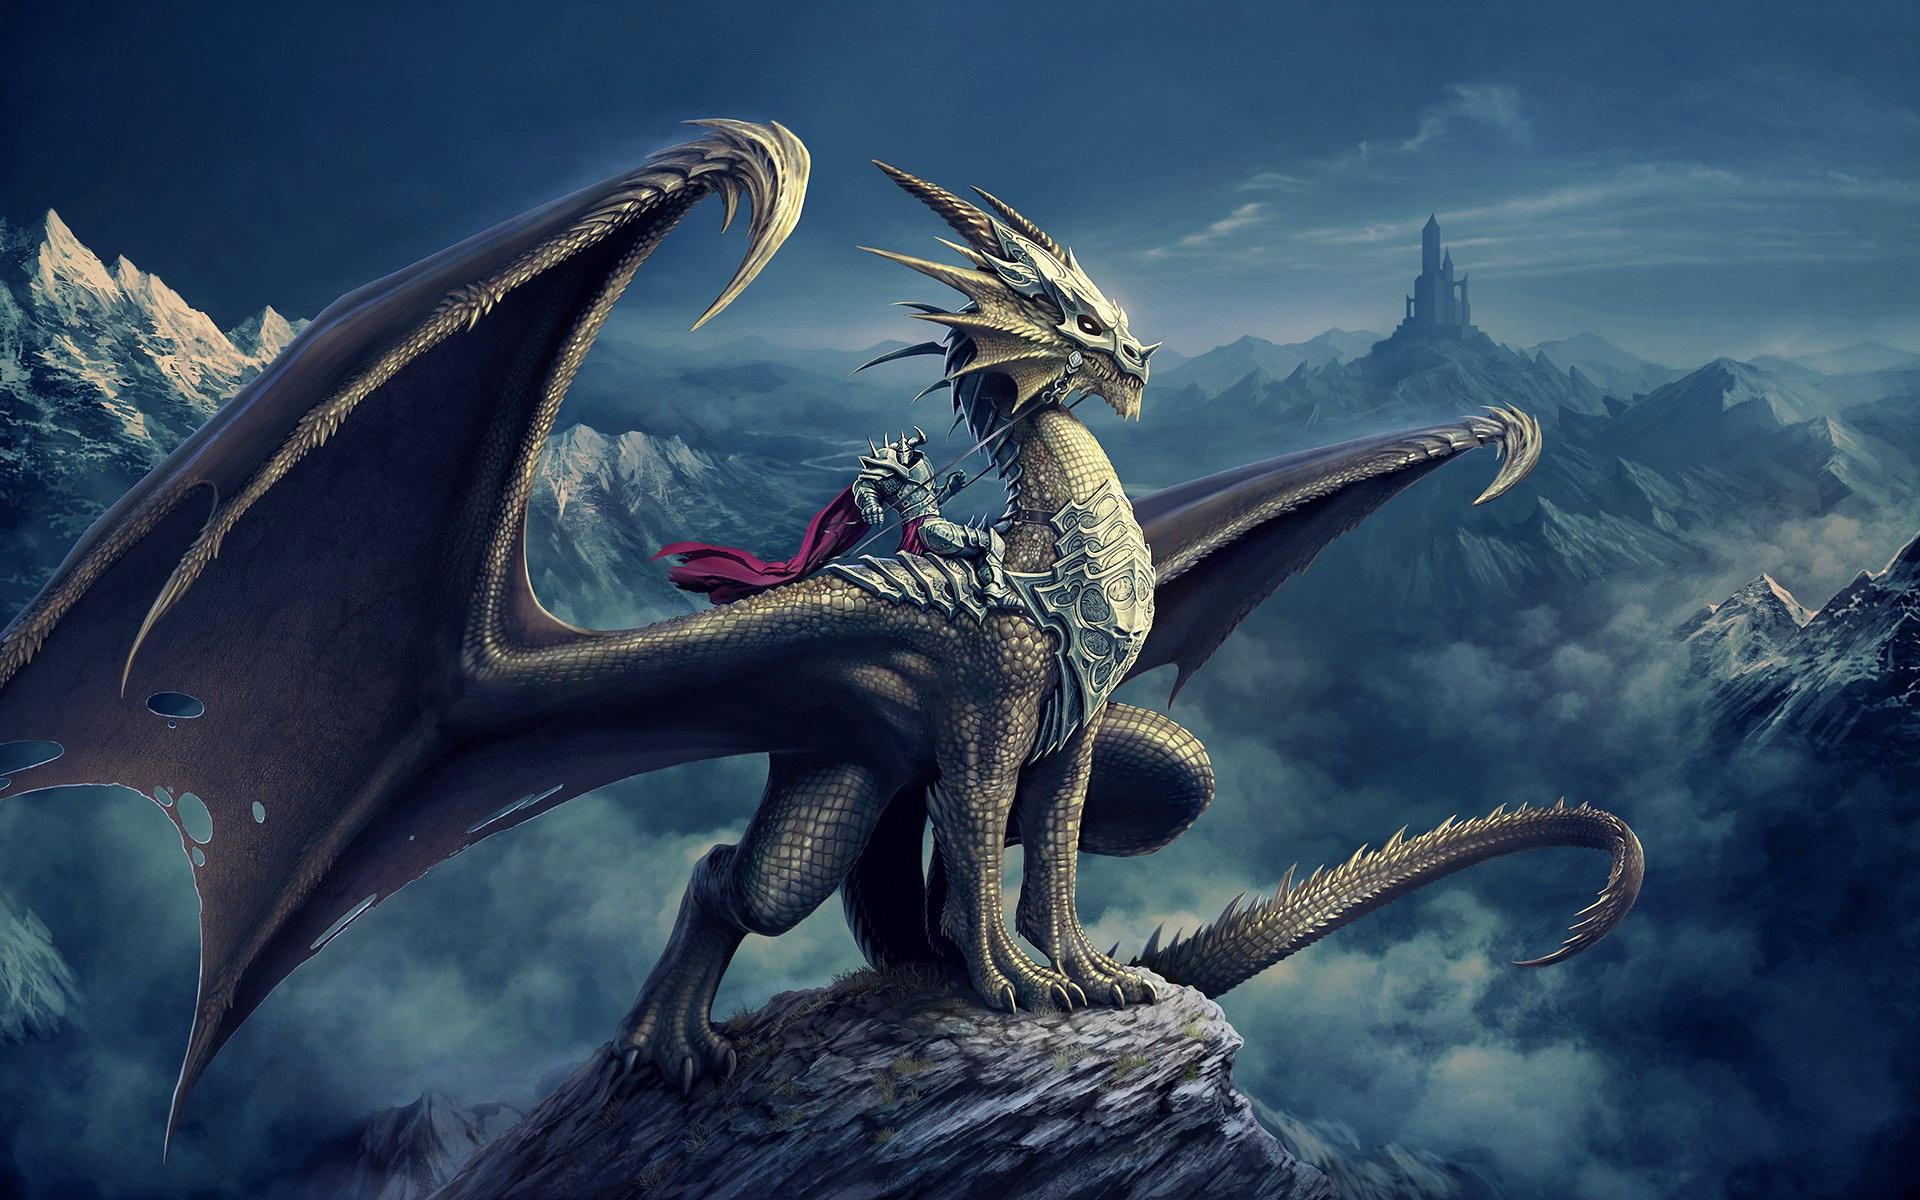 dragon background image dragon desktop wallpapers dragon hd wallpapers 1920x1200